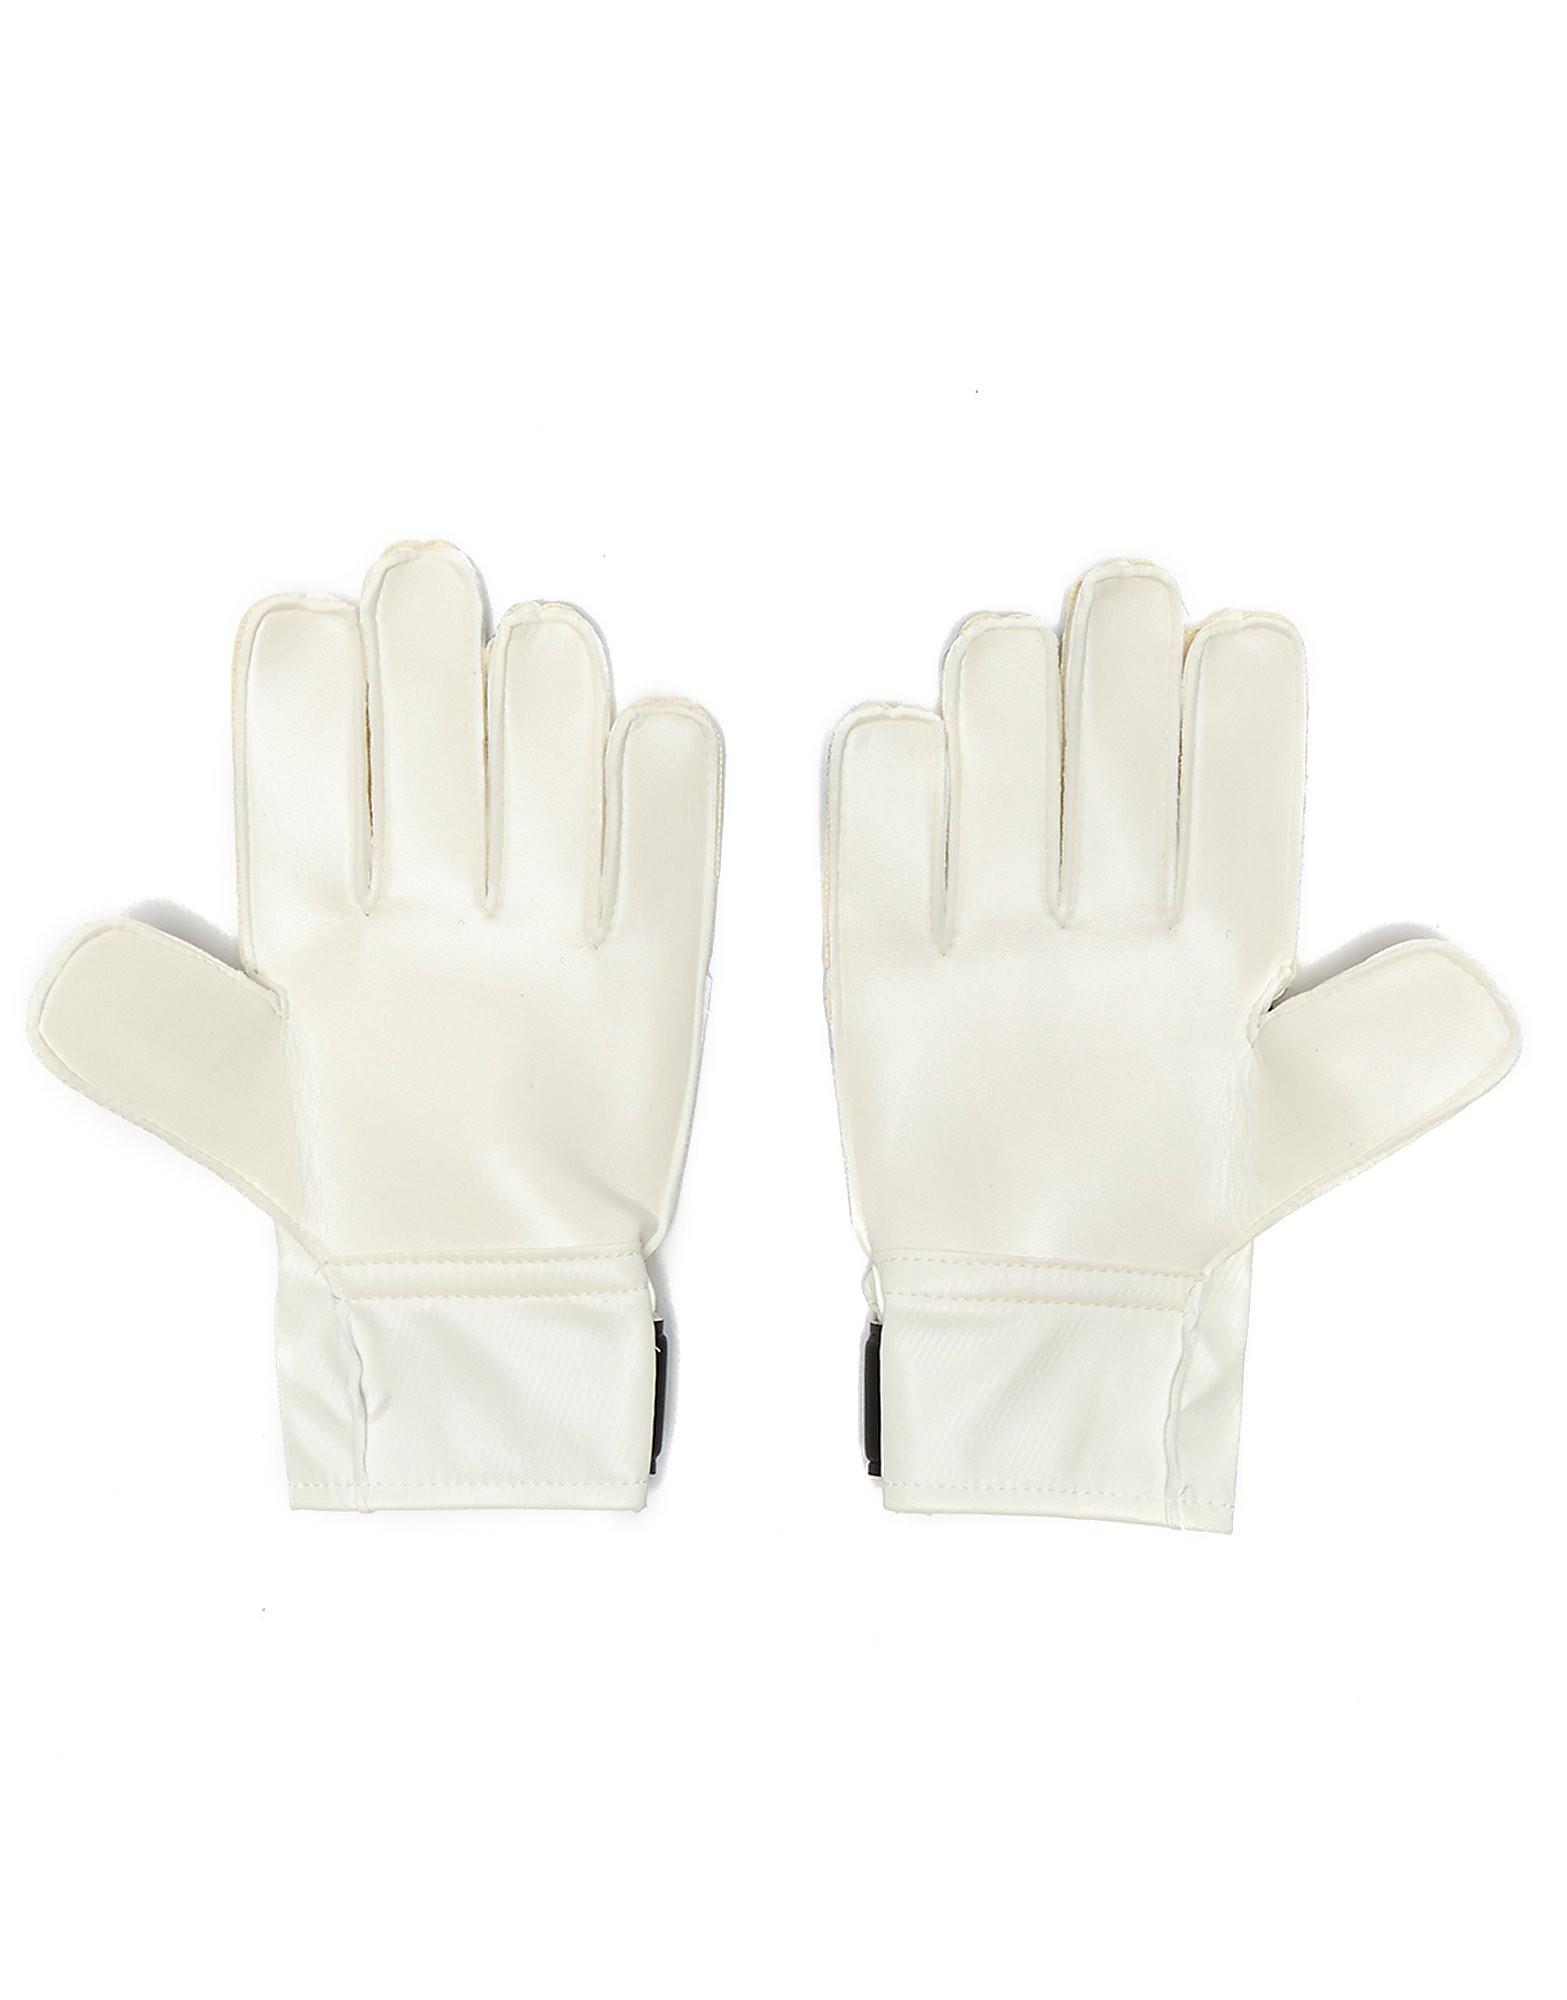 adidas Classic Lite Goalkeeper Gloves